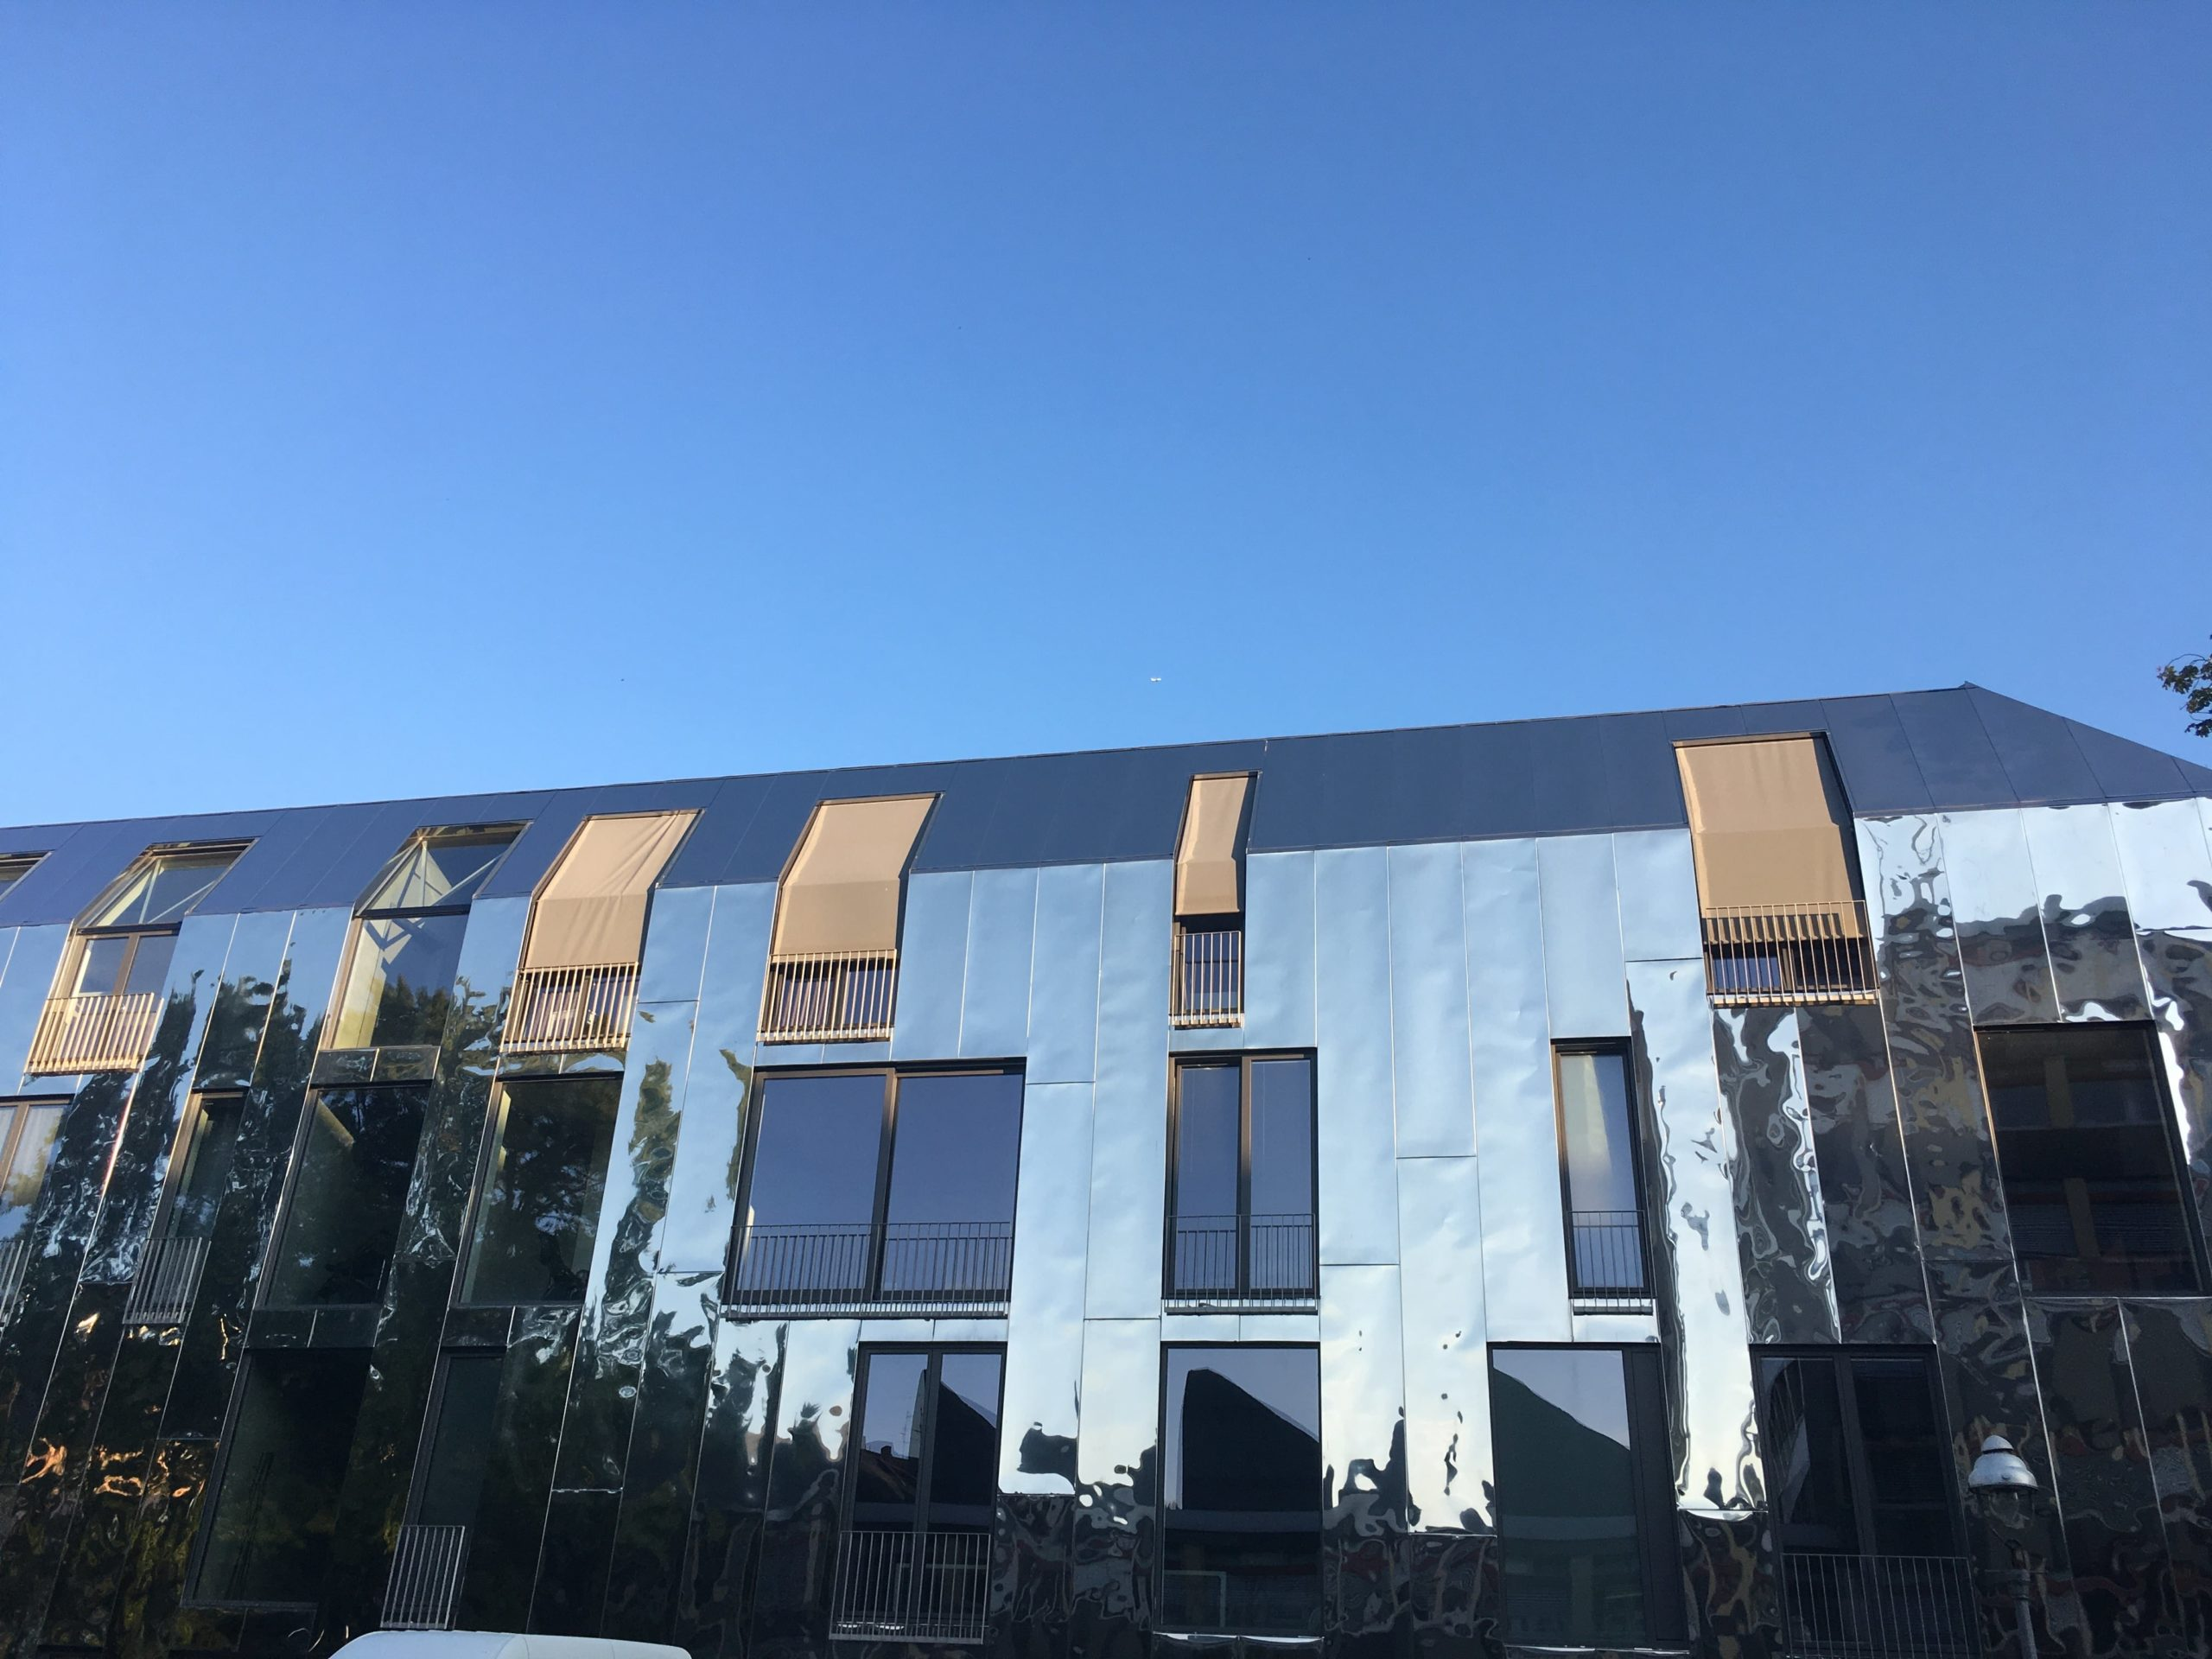 Visite architecture pour Berlinois